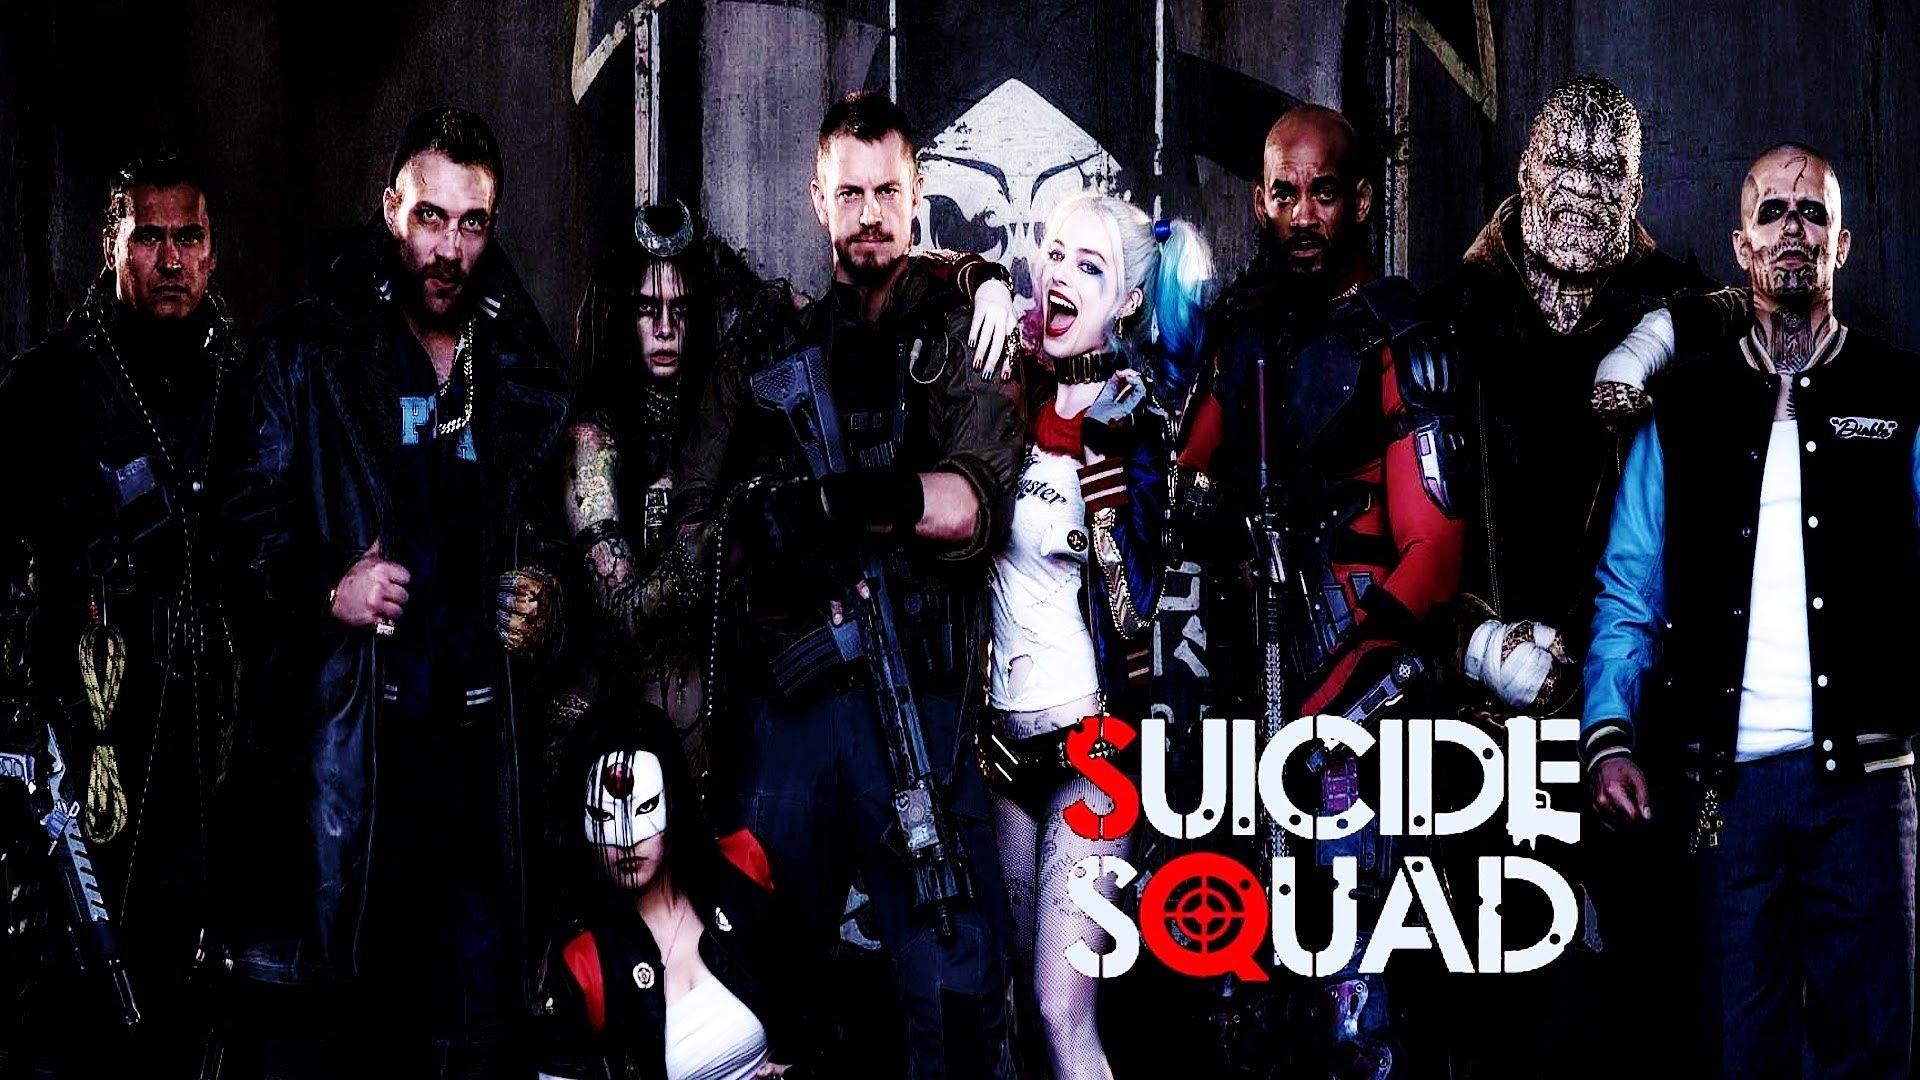 Suicide Squad HD